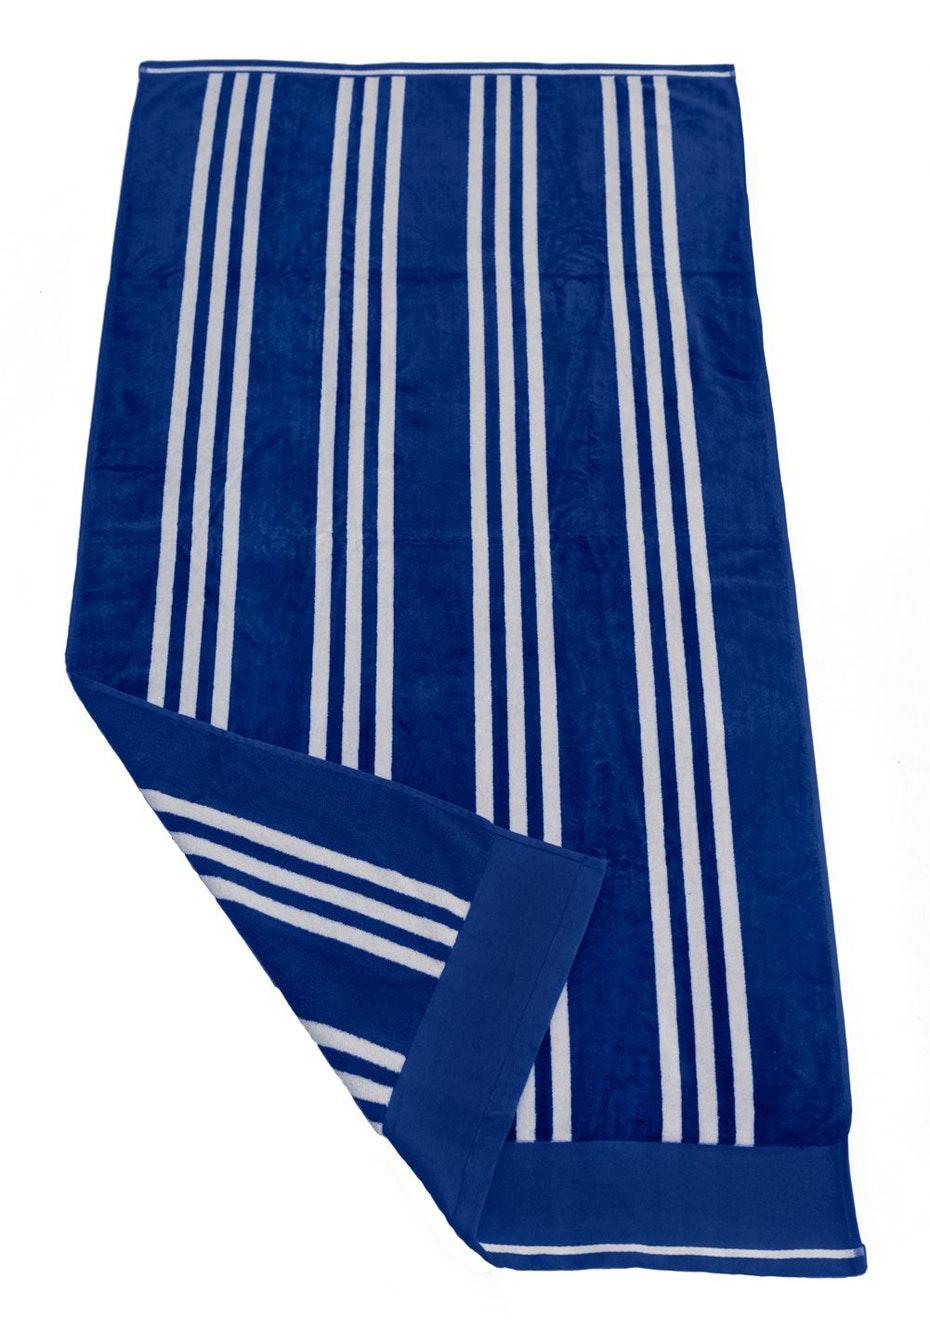 Coral Bay Velour Beach Towel Royal